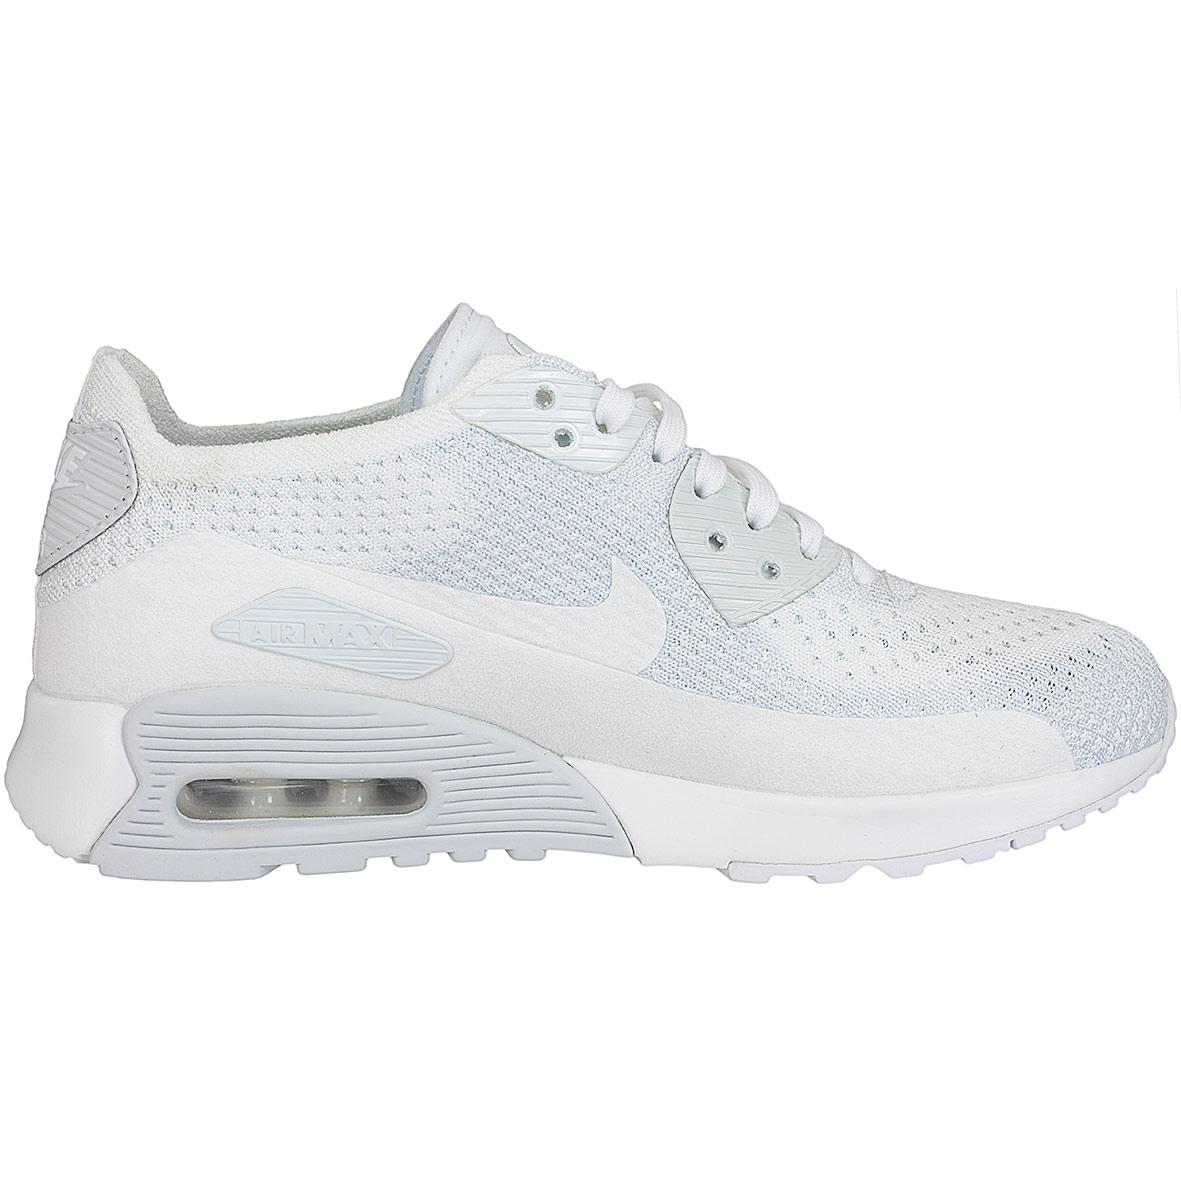 Nike Damen Turnschuhe Air Max 90 Ultra 2.0 Flyknit weiß weiß